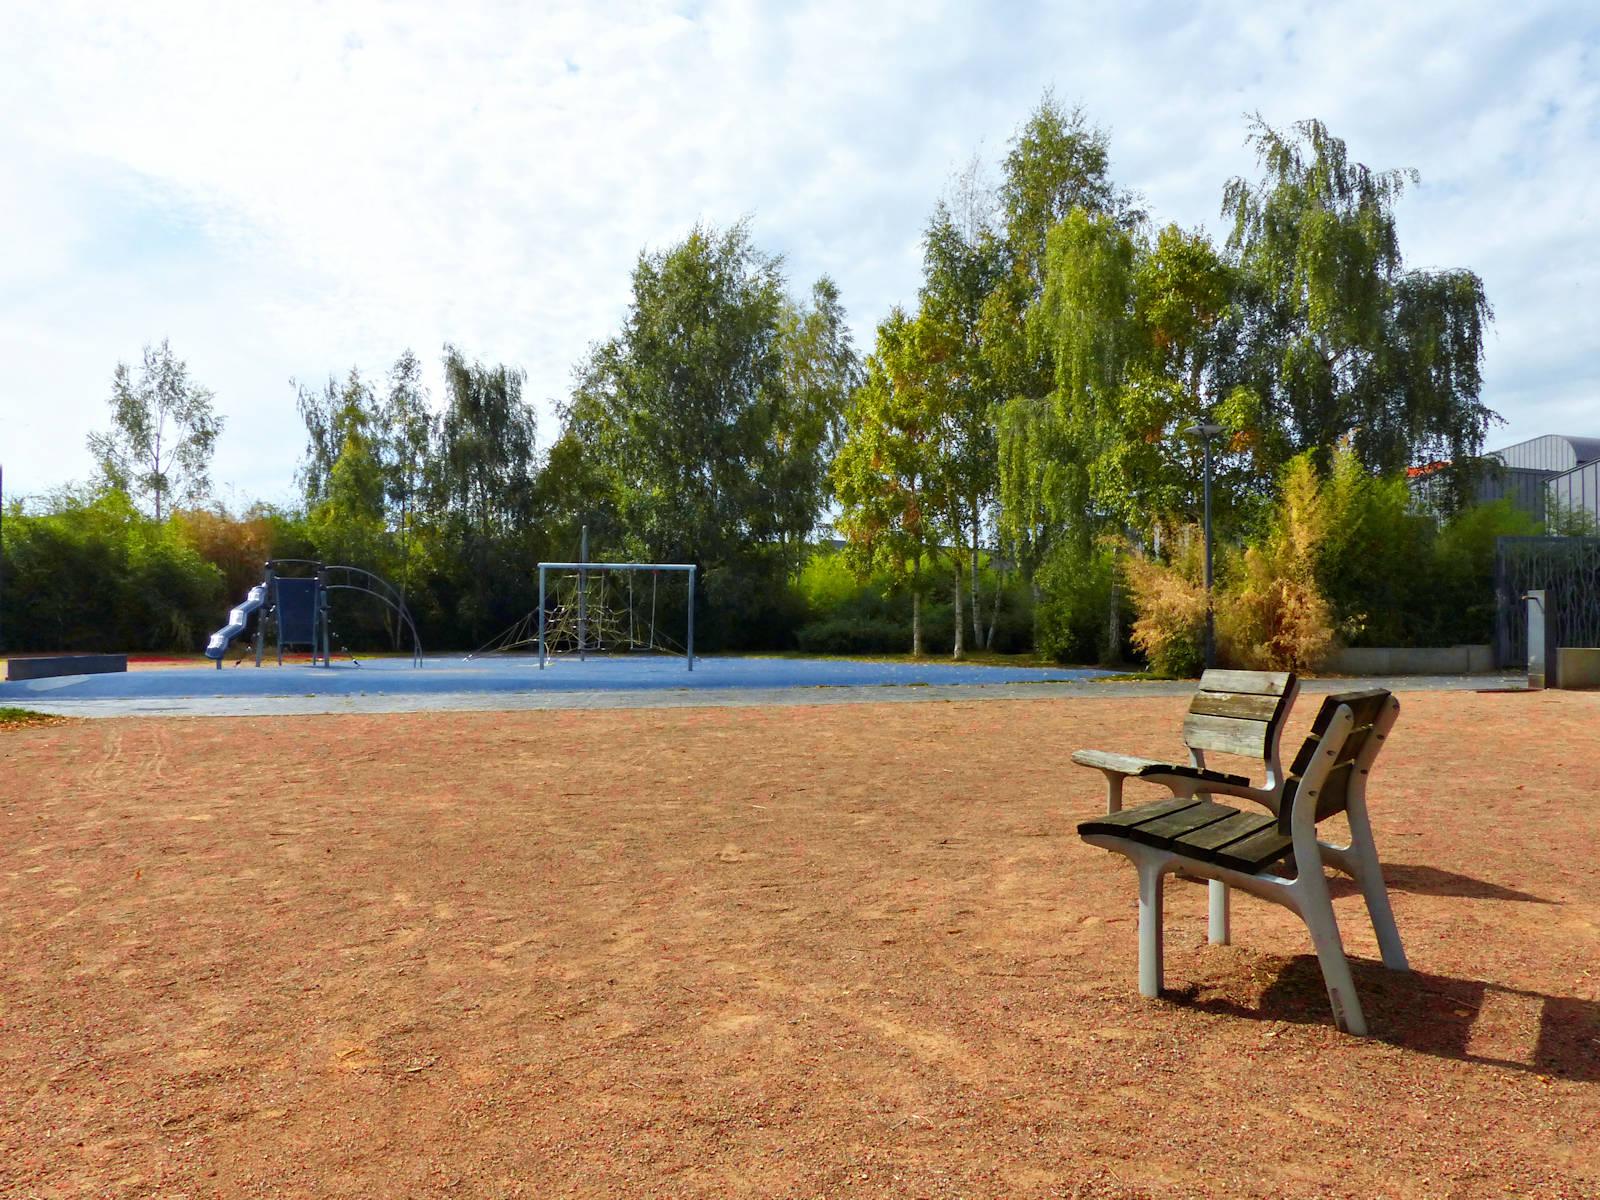 Jardin Jean Moulin, Tourcoing - Aire de jeu